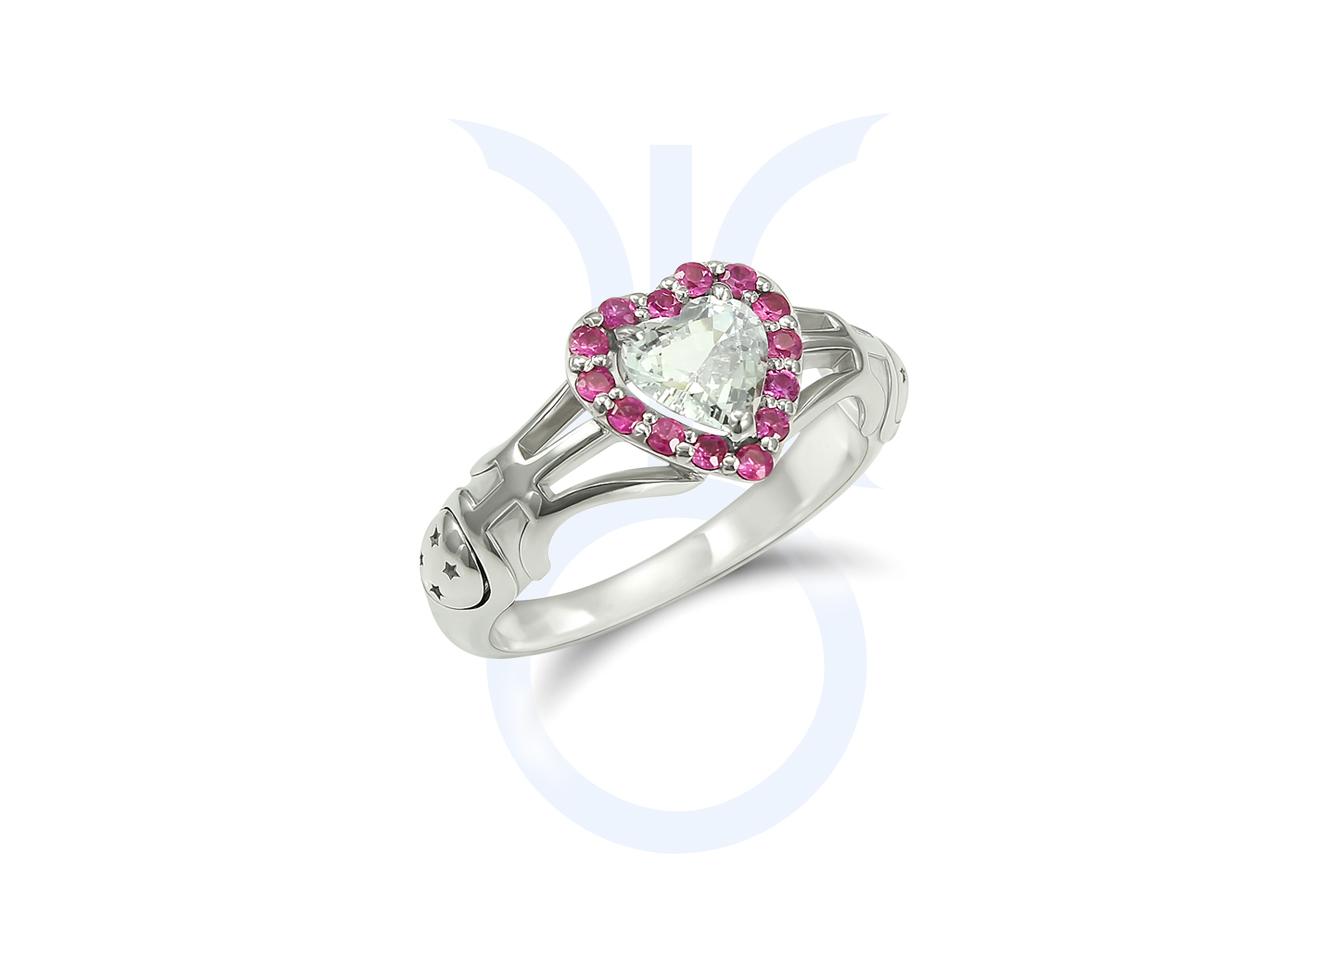 featured-image-sailor-uranus-heart-ring.jpg